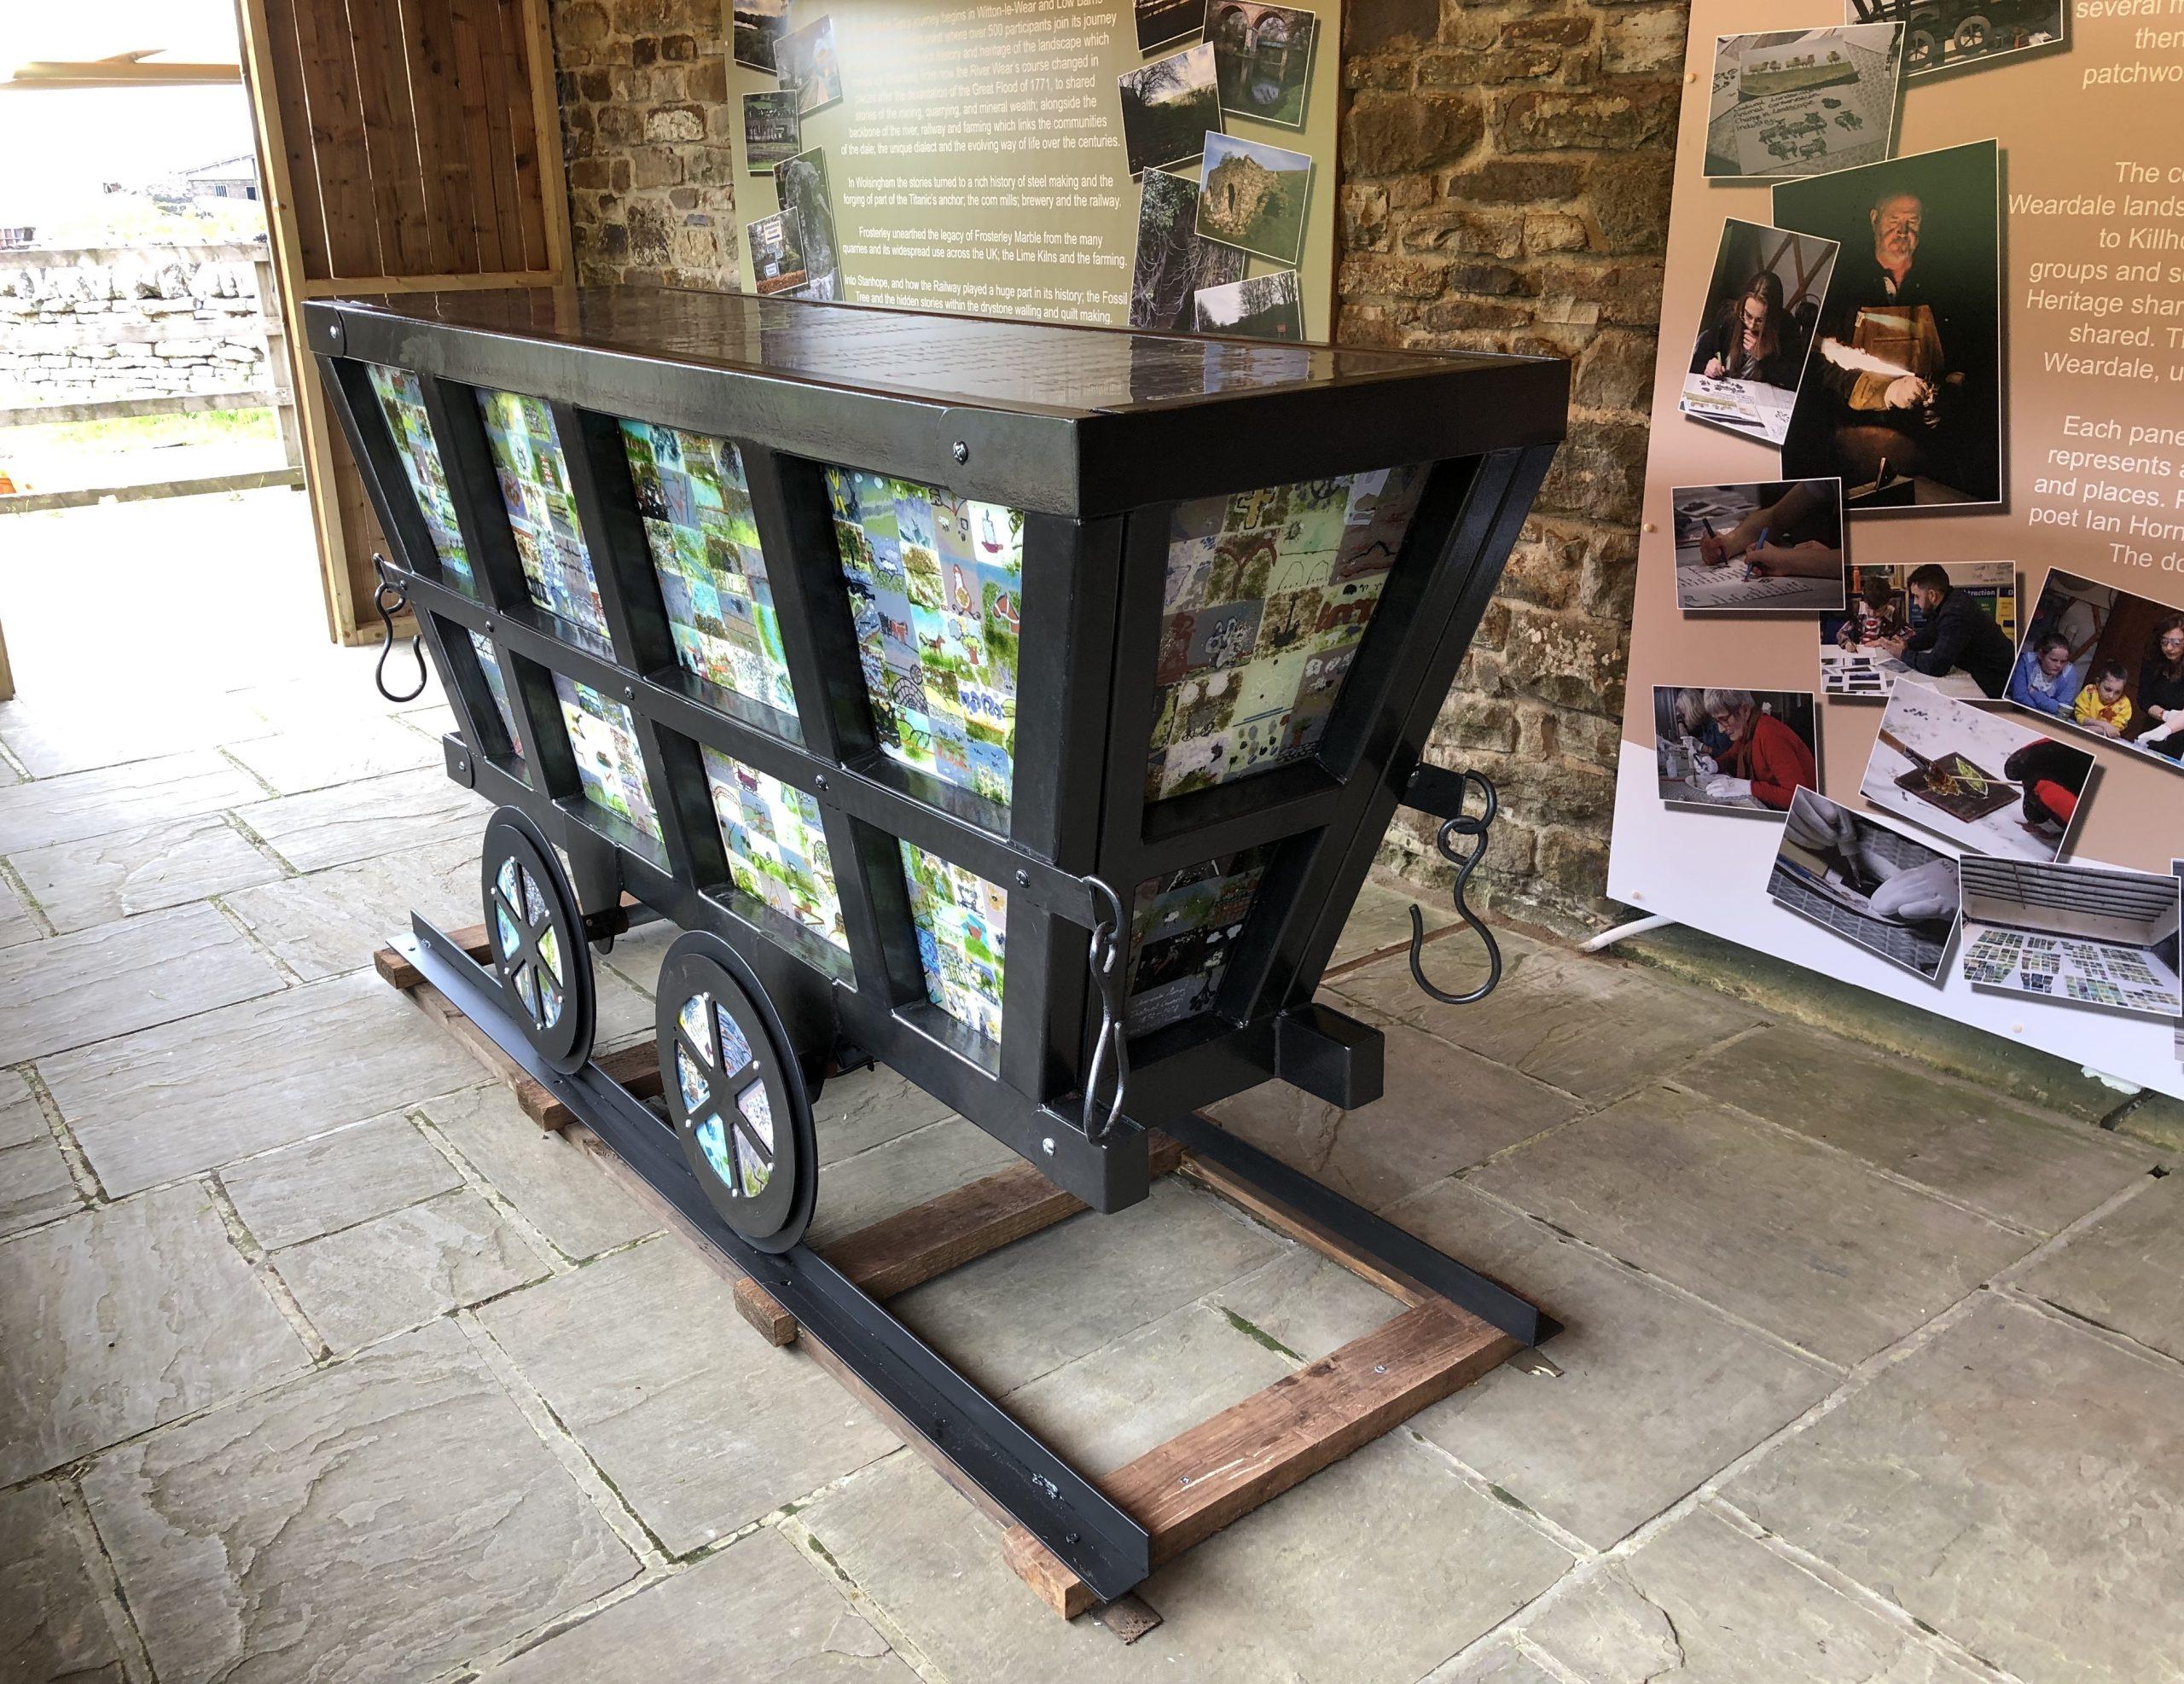 Kilhope Wheel Weardale Tub The Print Mine